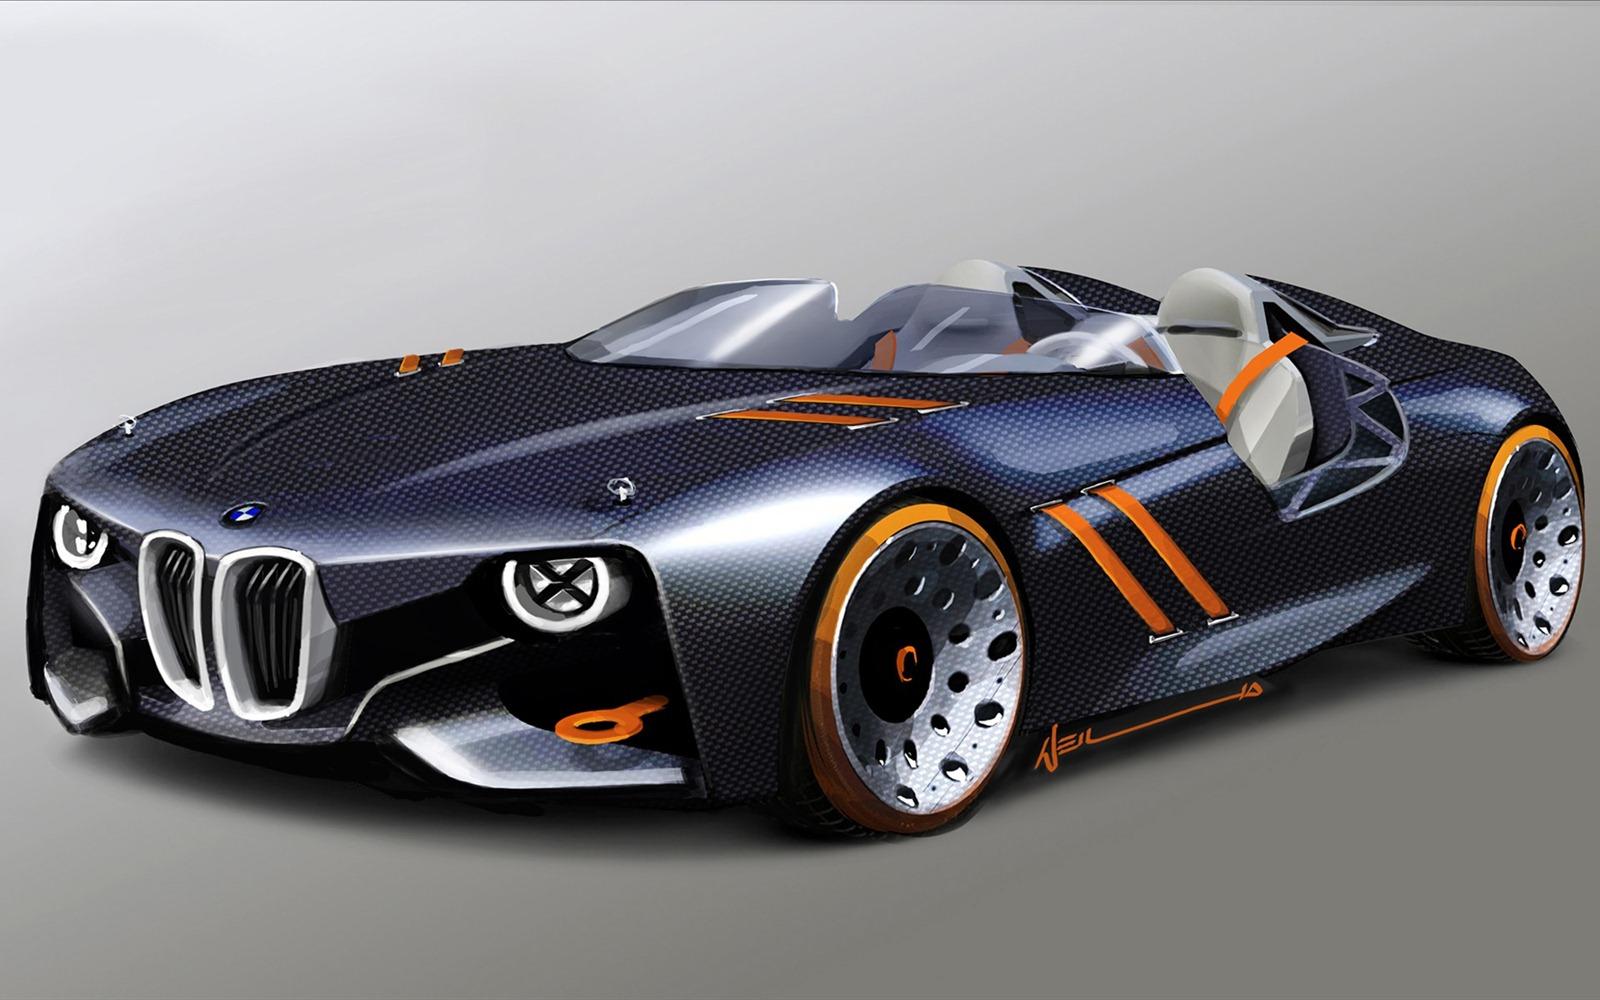 http://4.bp.blogspot.com/-w_ZgQkksADE/UOOt12YdUlI/AAAAAAAAAsg/lxVmJnqlRgs/s1600/2011-BMW-328-Hommage-Concept-1920x1200-Wallpapers-1.jpg